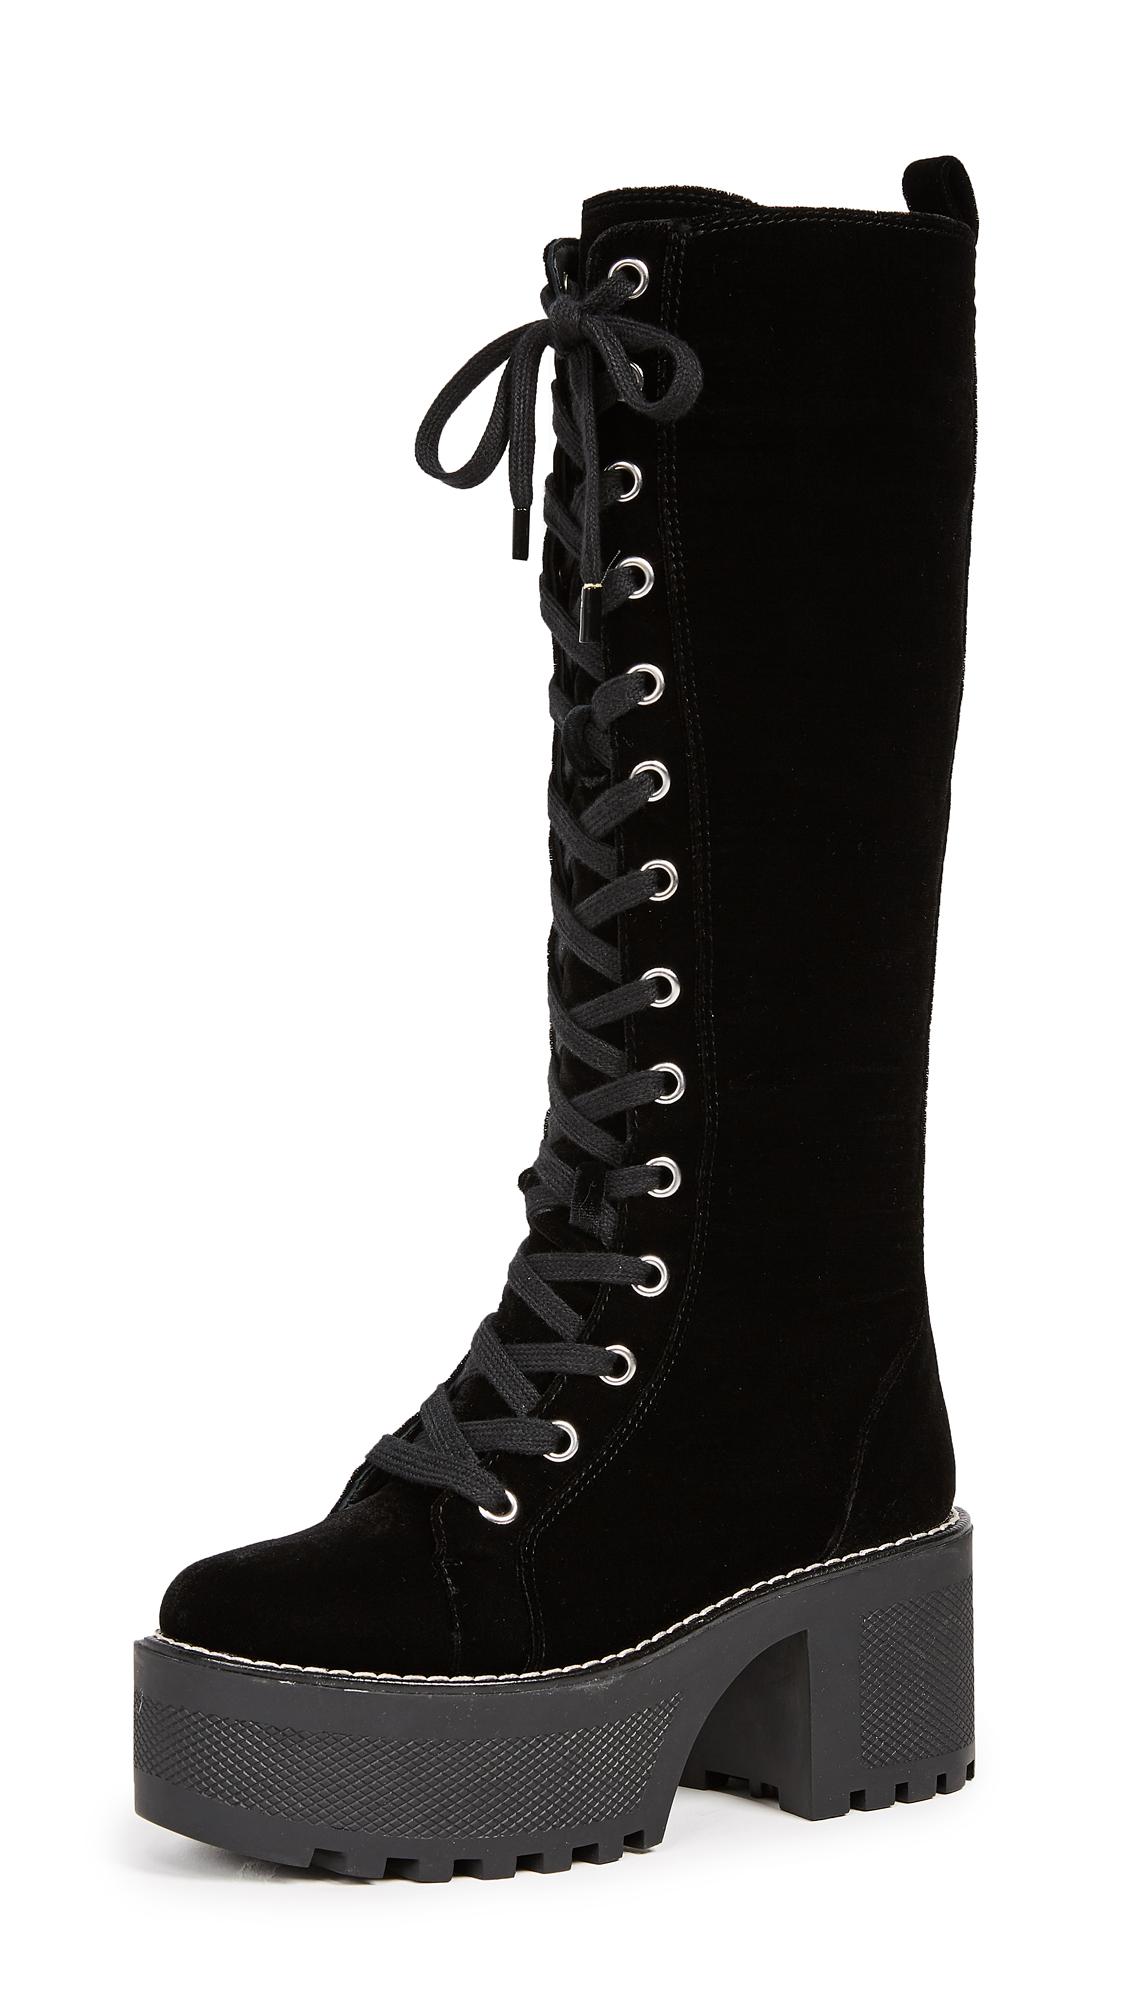 alice + olivia Raye Platform Boots - Black